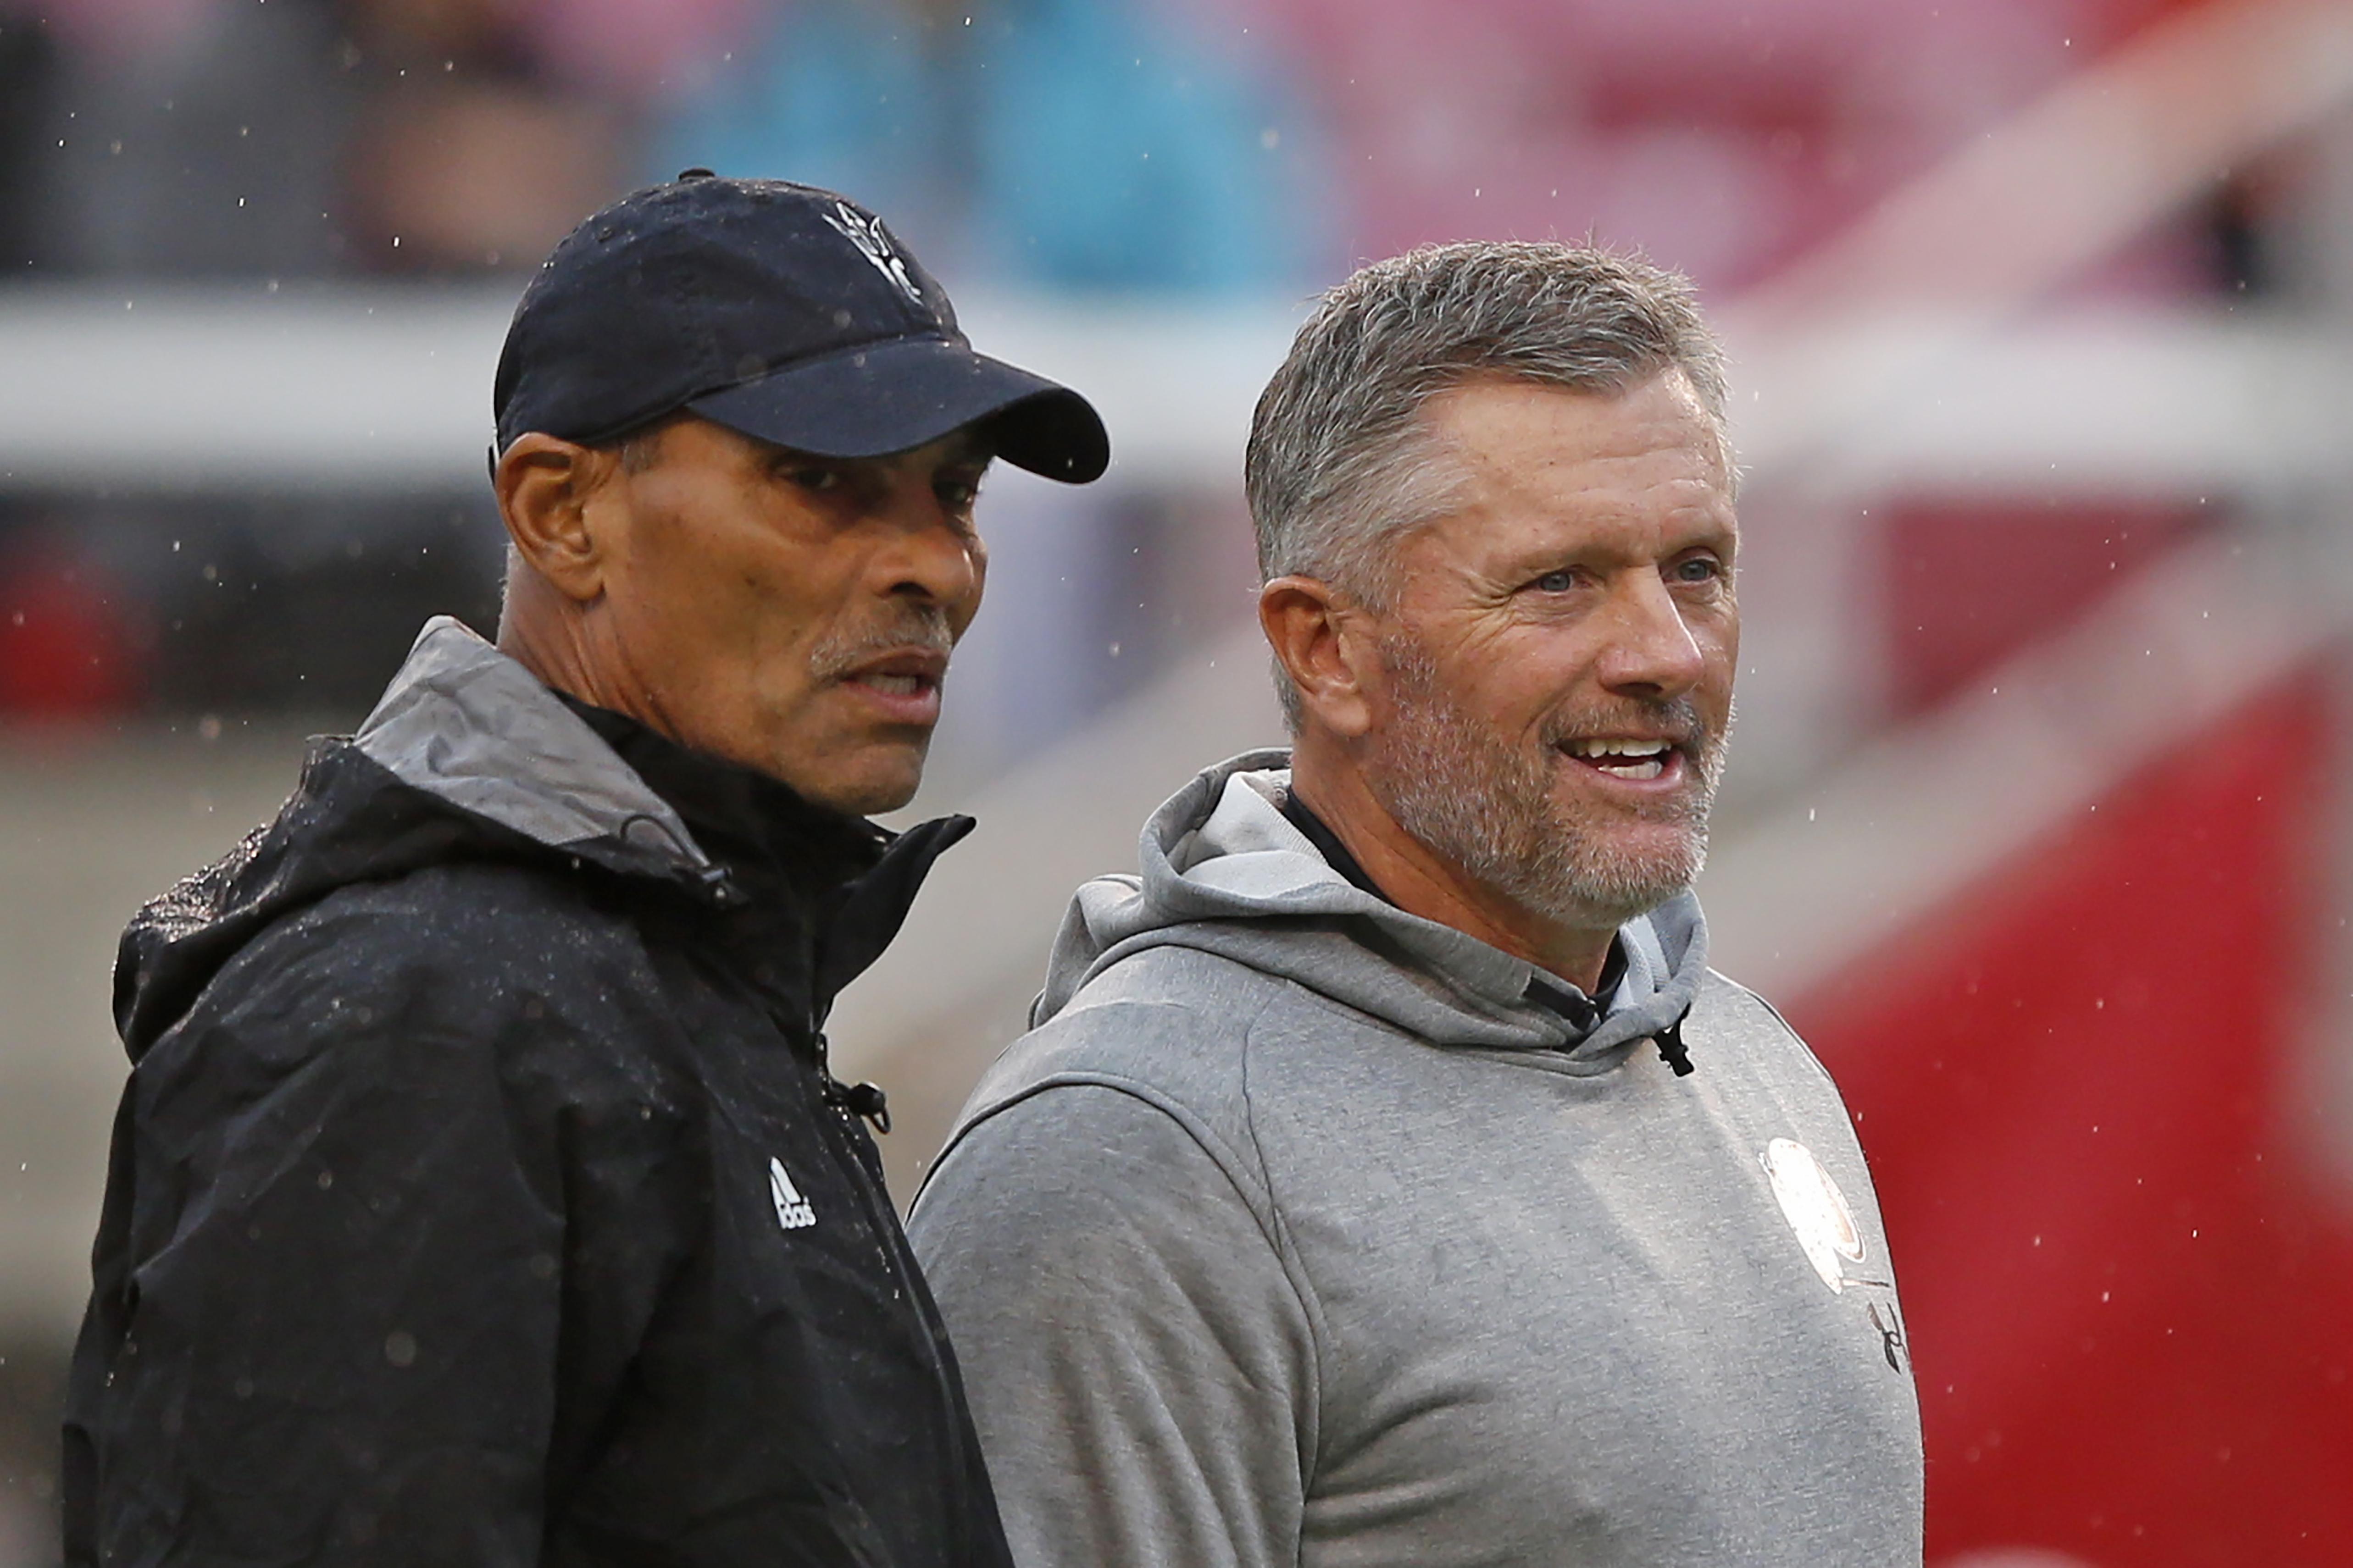 ASU coach Herm Edwards, left, and Utah coach Kyle Whittingham speak before a game Saturday, Oct. 19, 2019, in Salt Lake City.